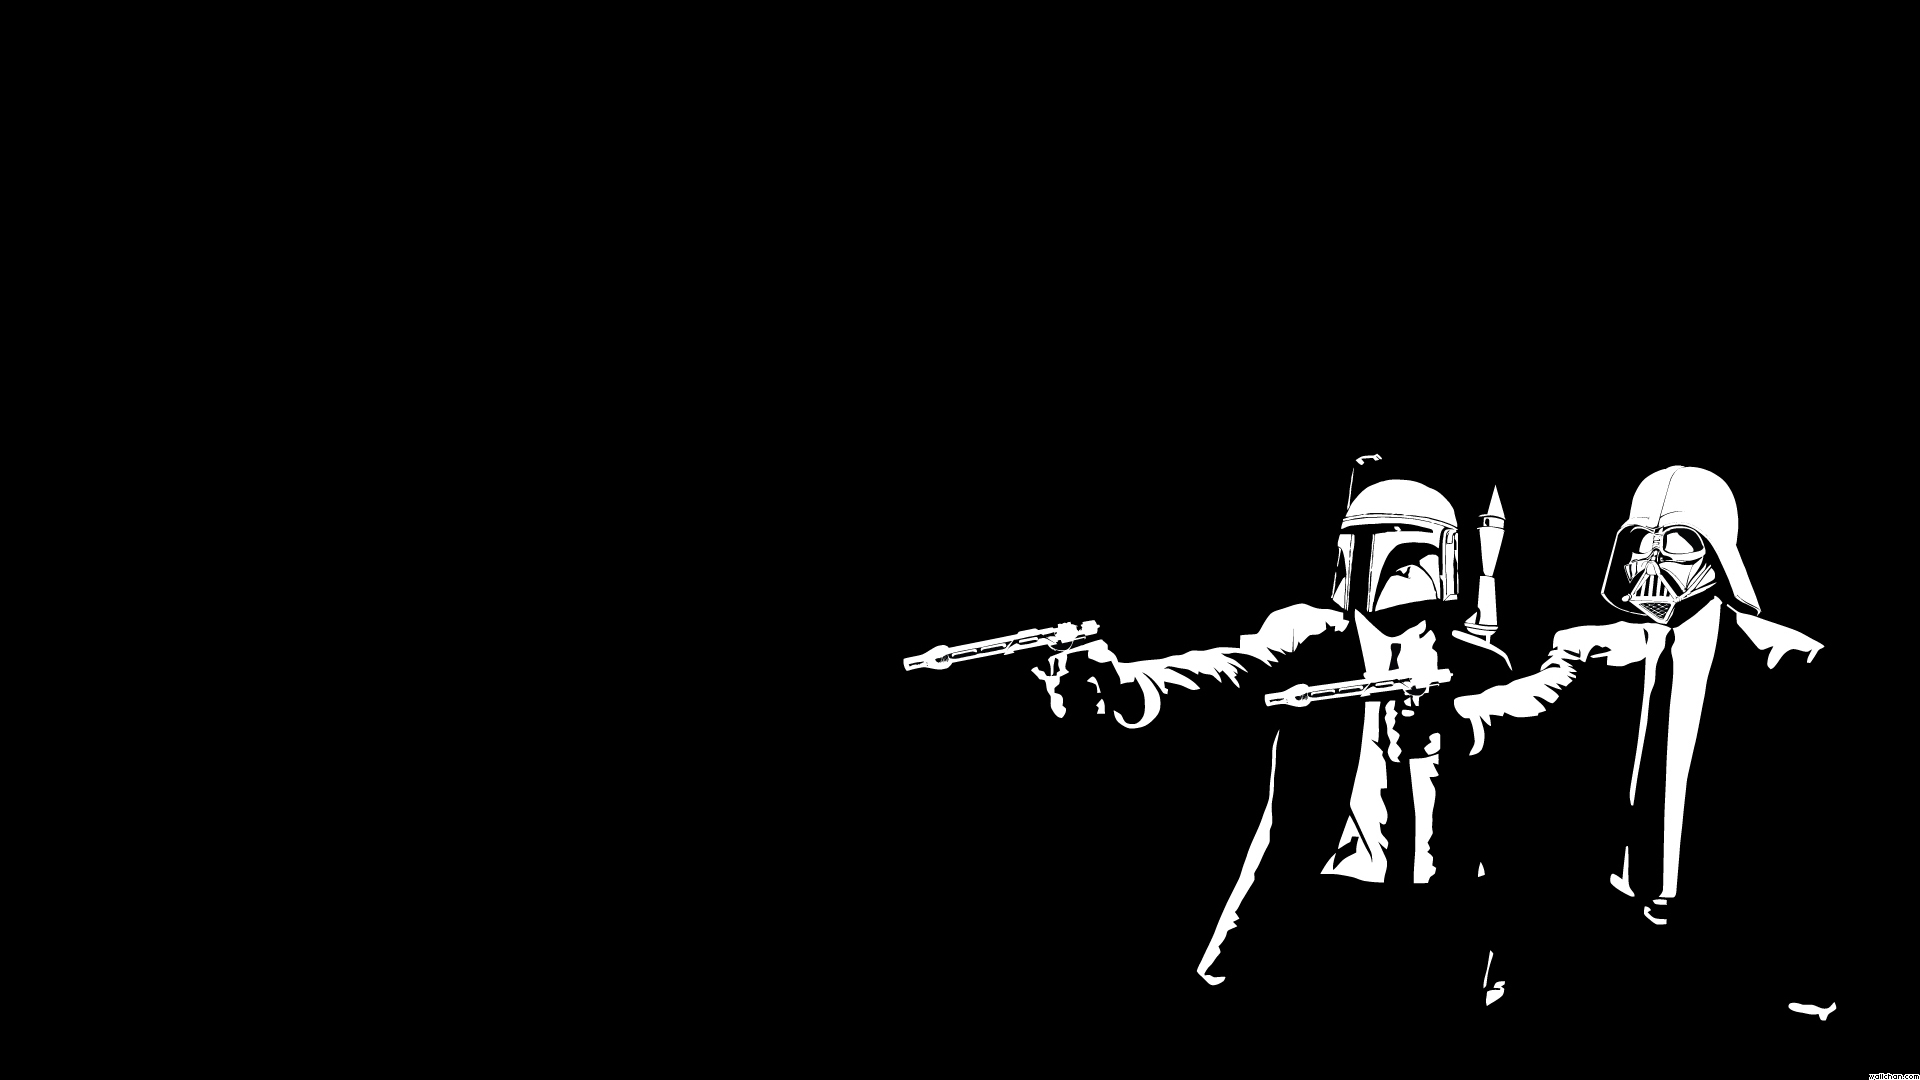 desktop backgrounds star wars - sf wallpaper